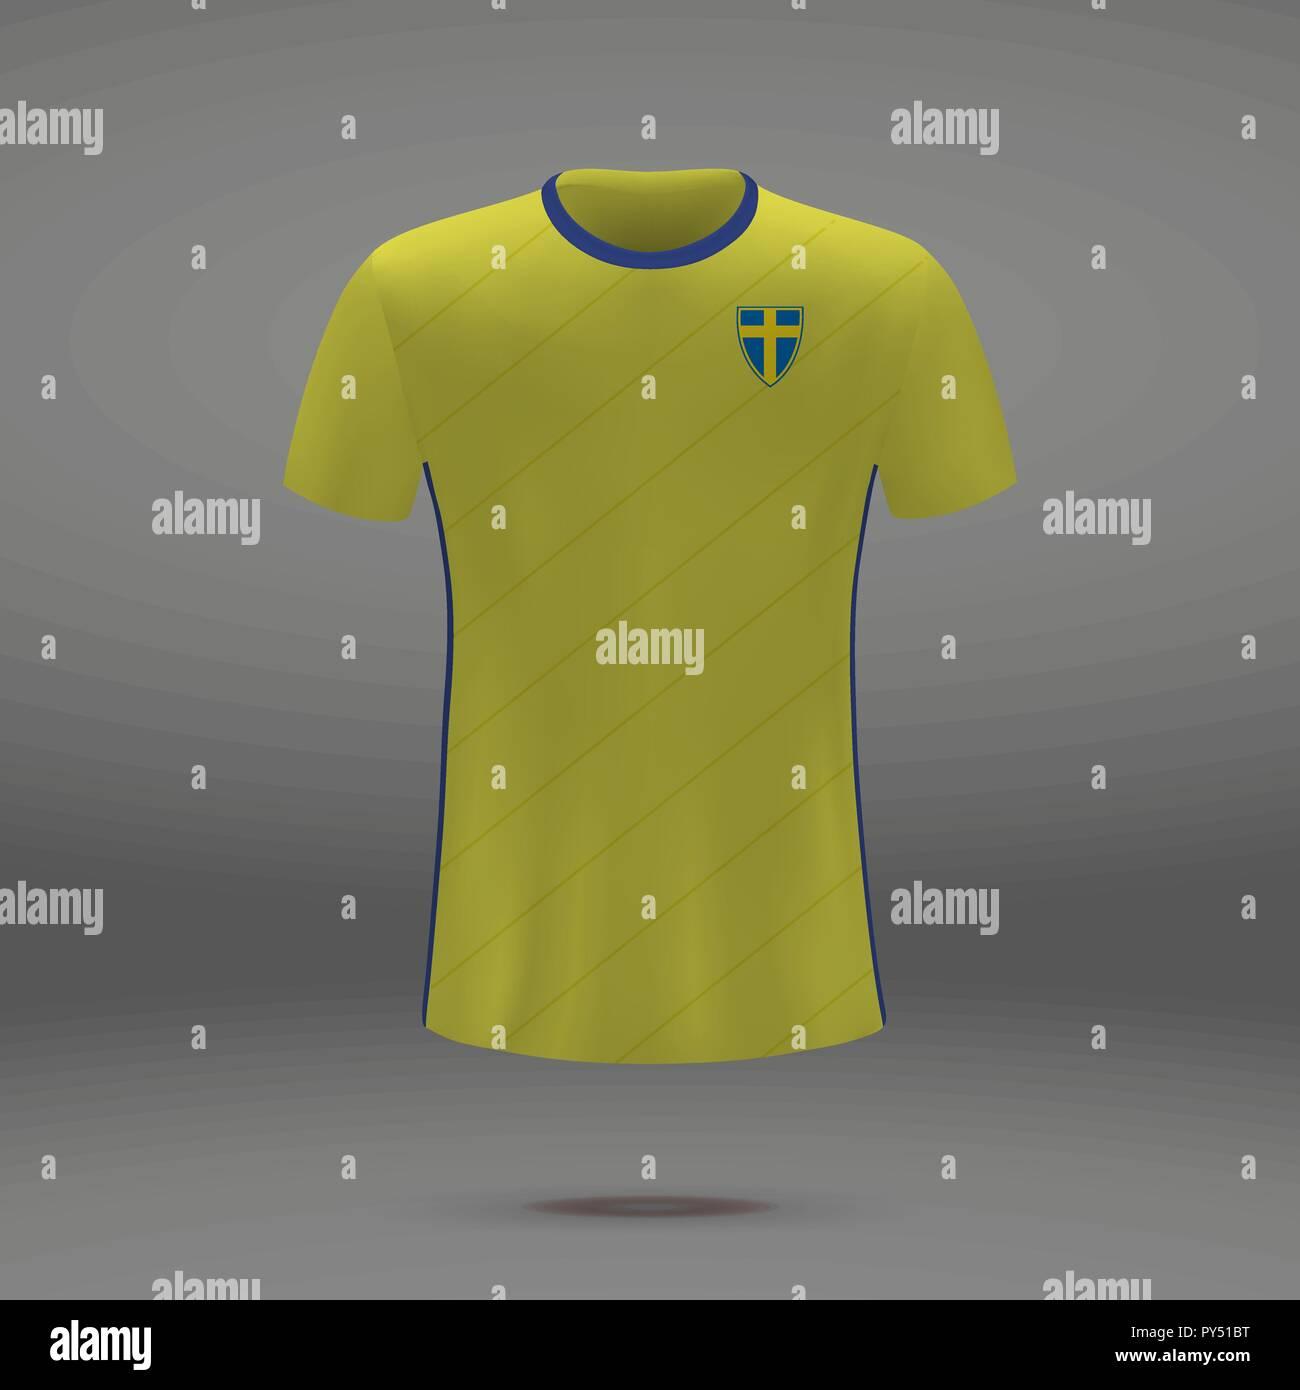 Football Kit Of Sweden 2018 T Shirt Template For Soccer Jersey